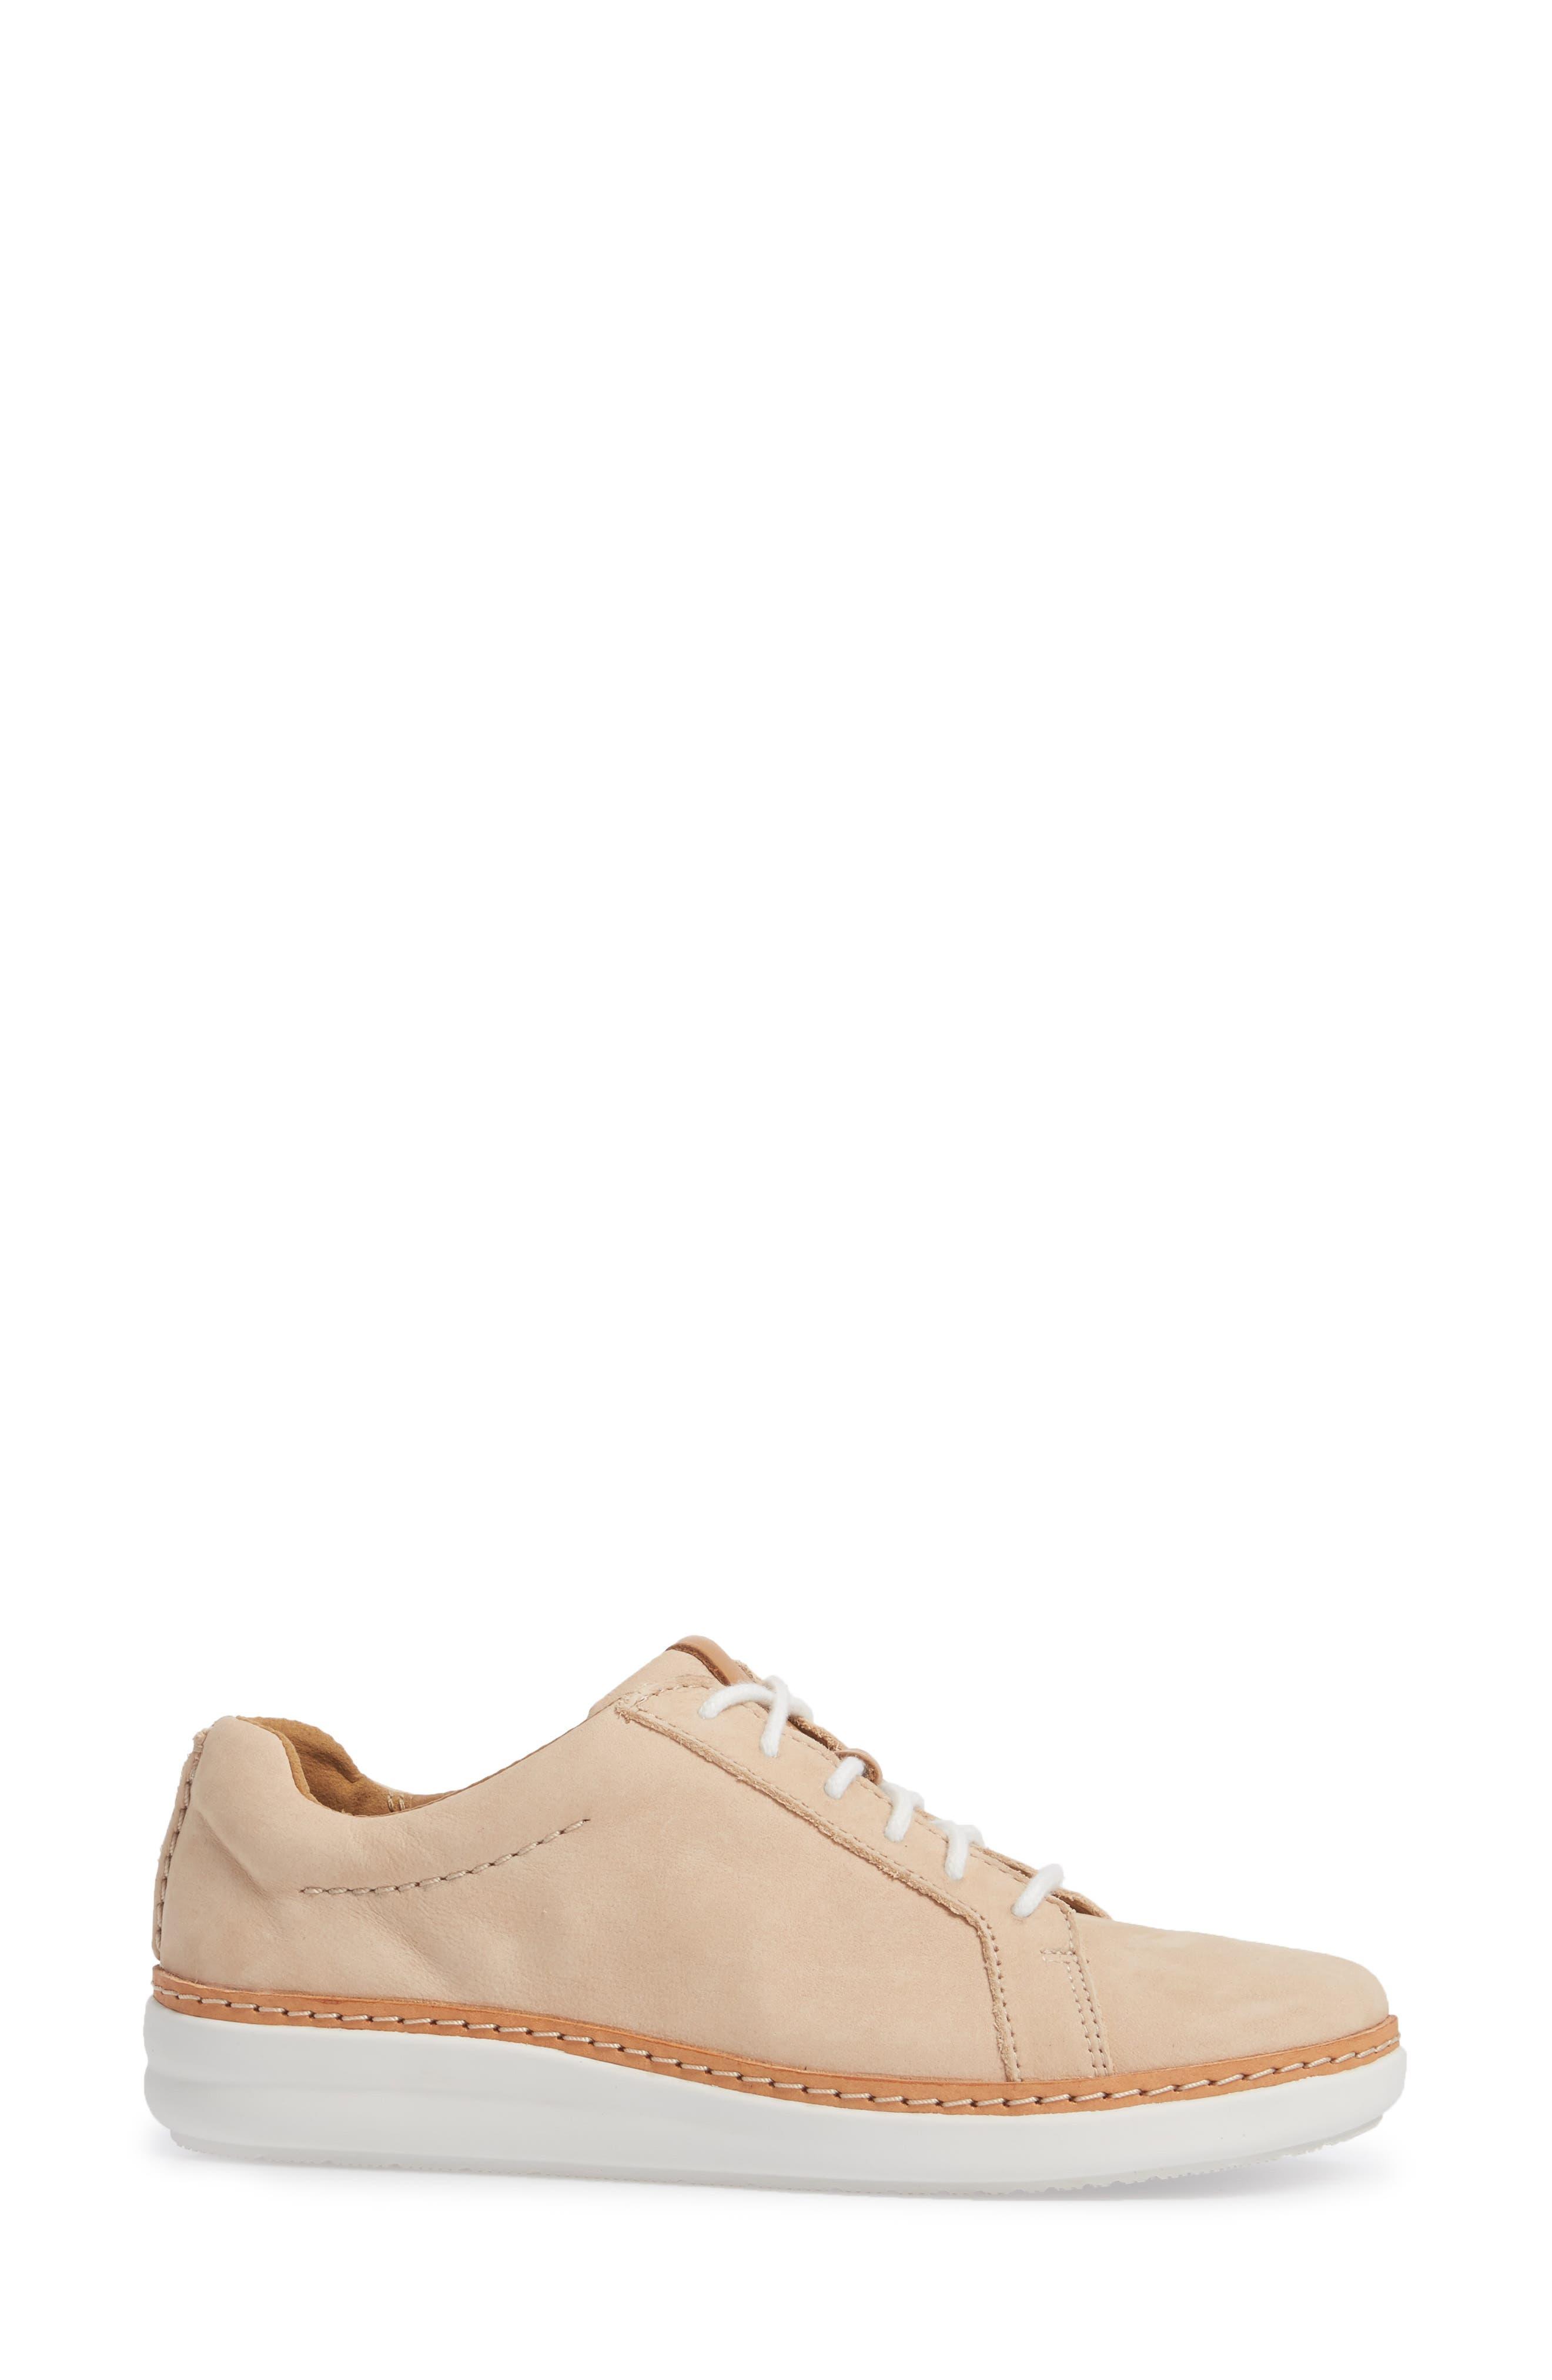 Amberlee Rosa Sneaker,                             Alternate thumbnail 3, color,                             NUDE NUBUCK